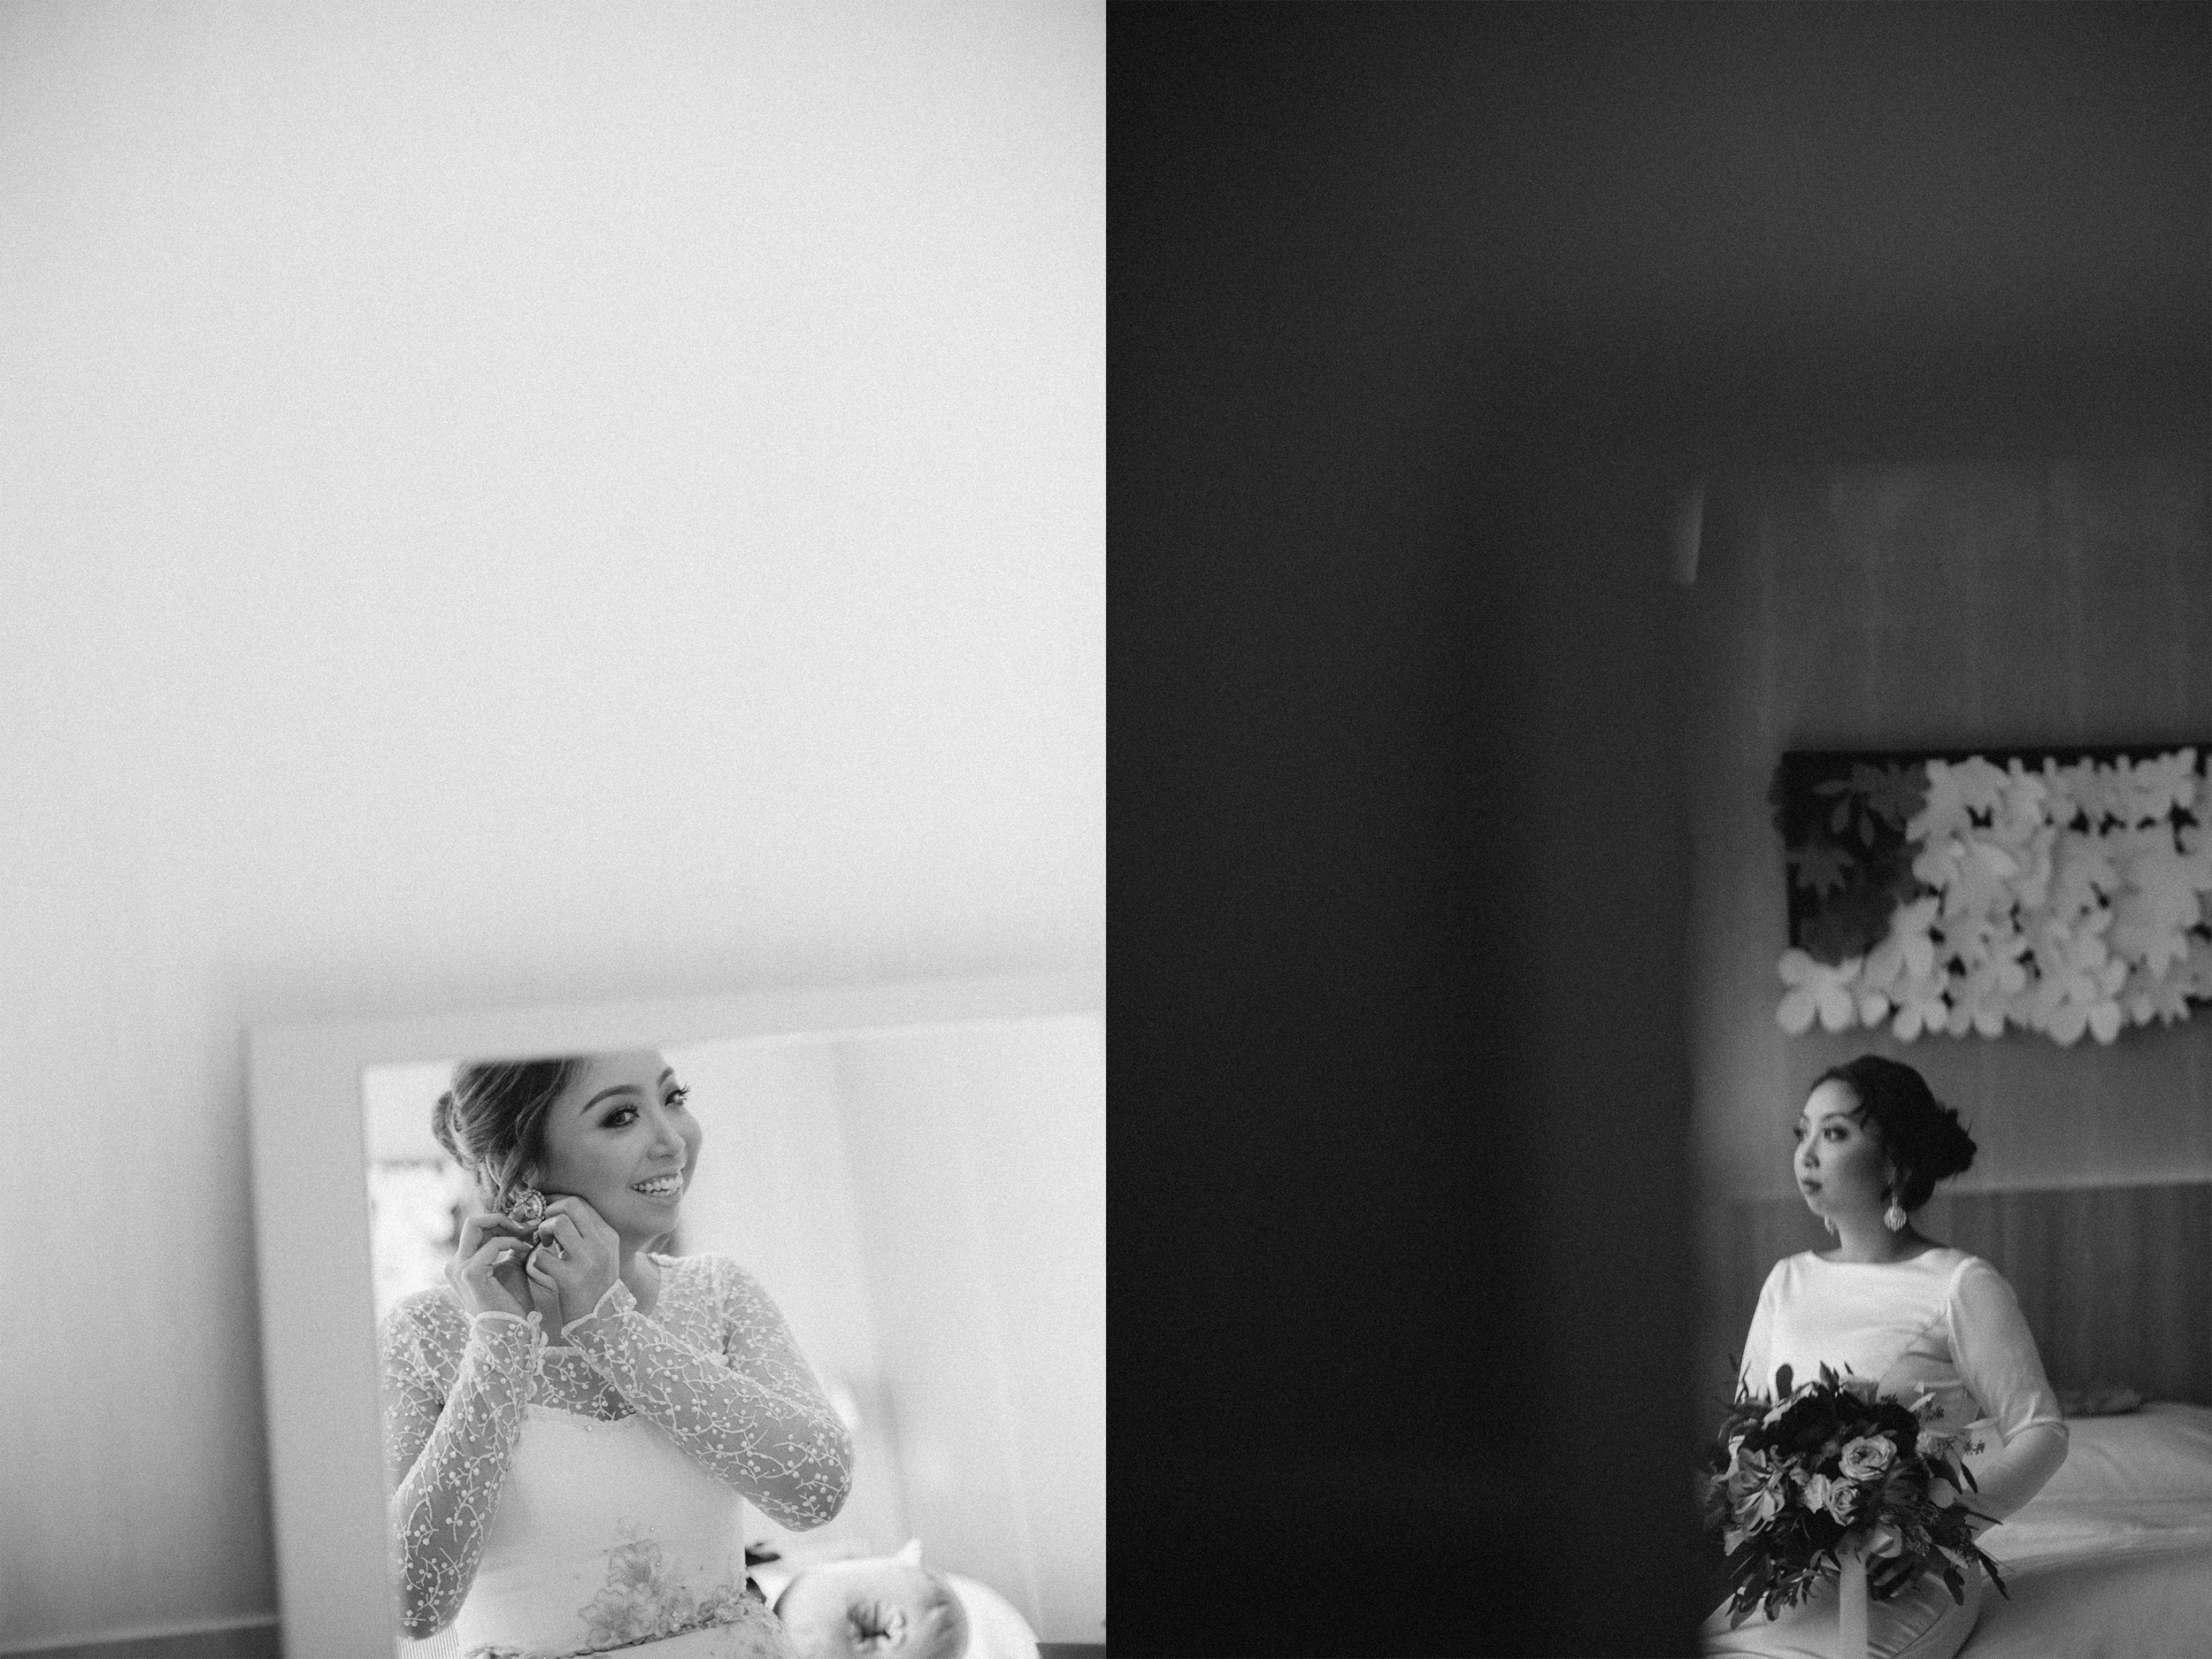 singapore-wedding-photographer-photography-wmt2017-113.jpg